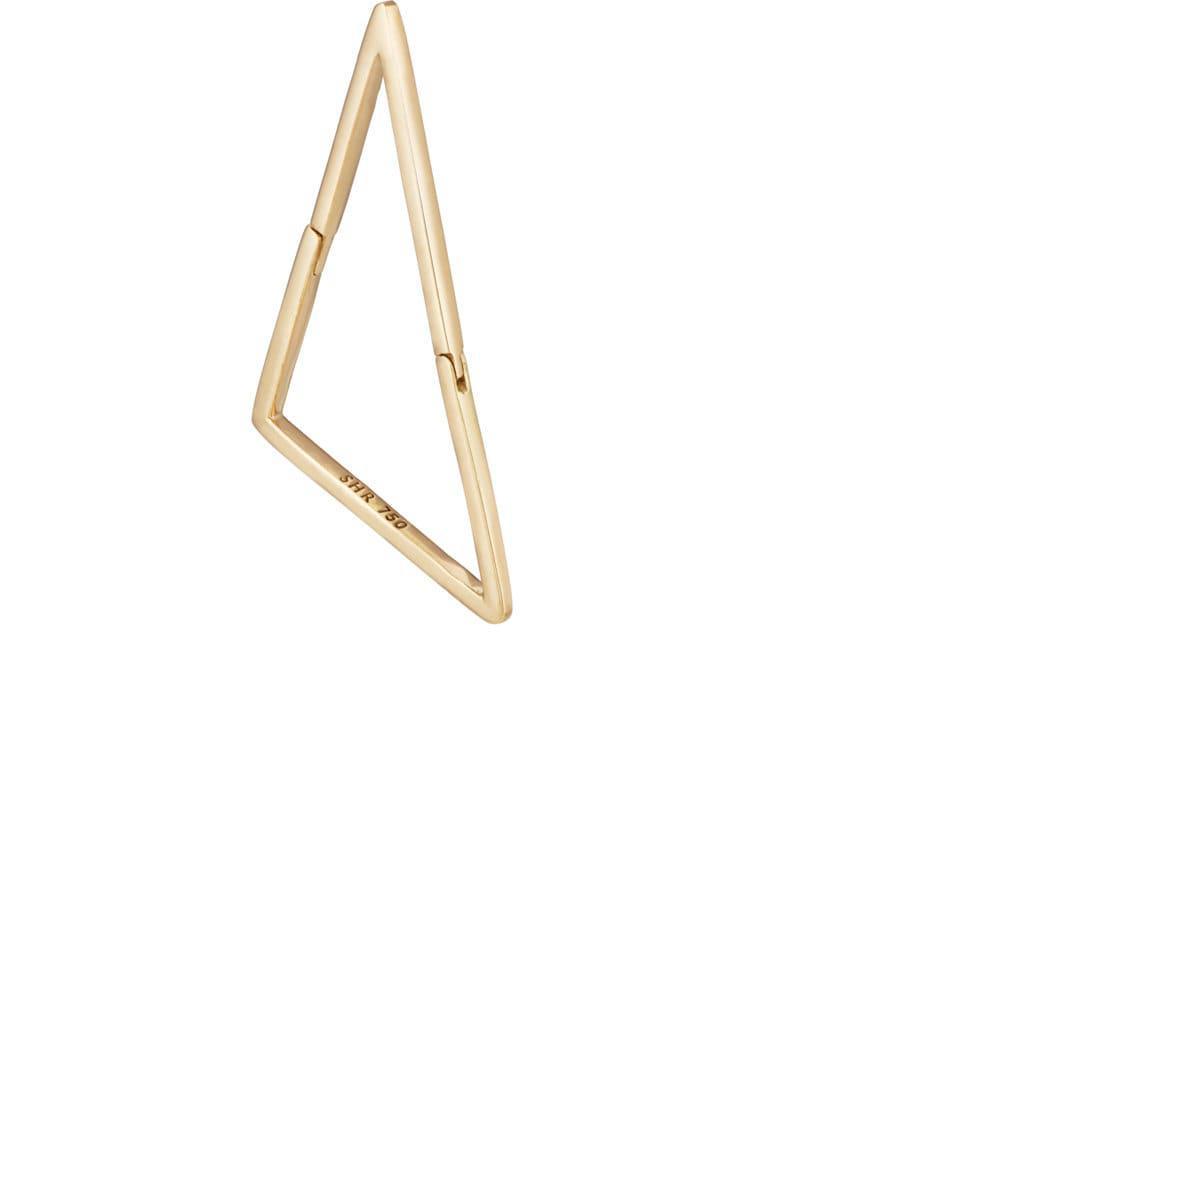 Shihara embellished bar earring - Metallic KvtKa